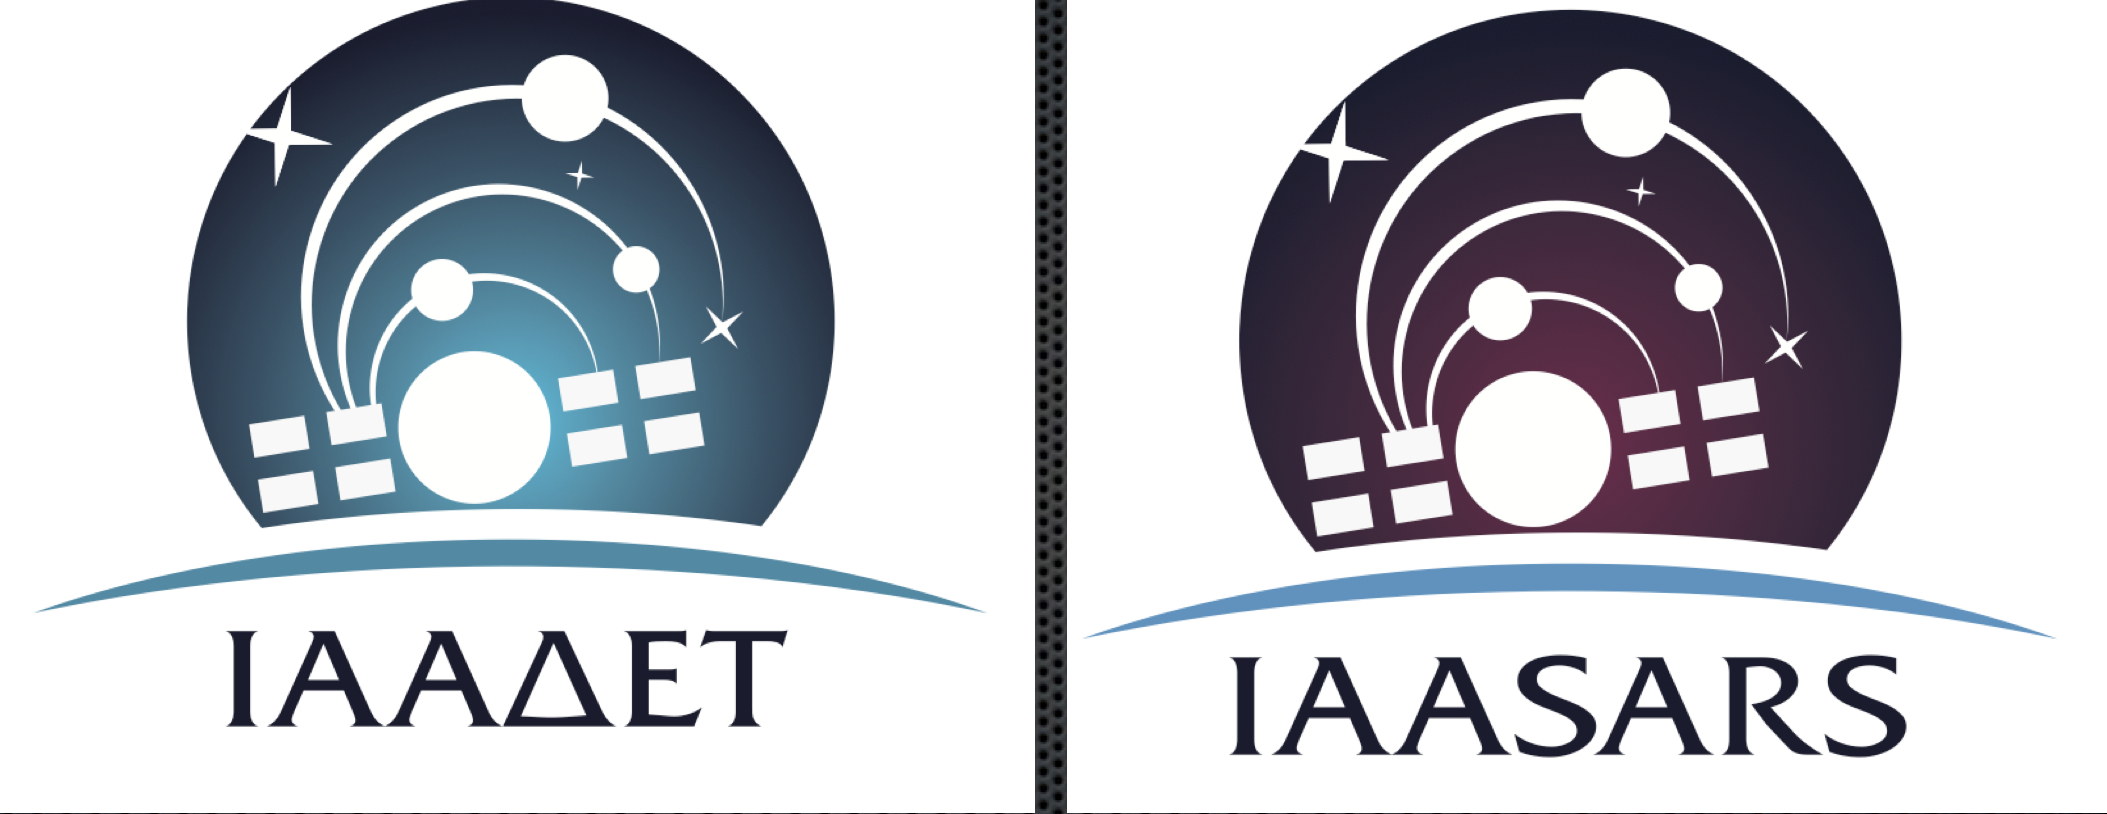 A111a